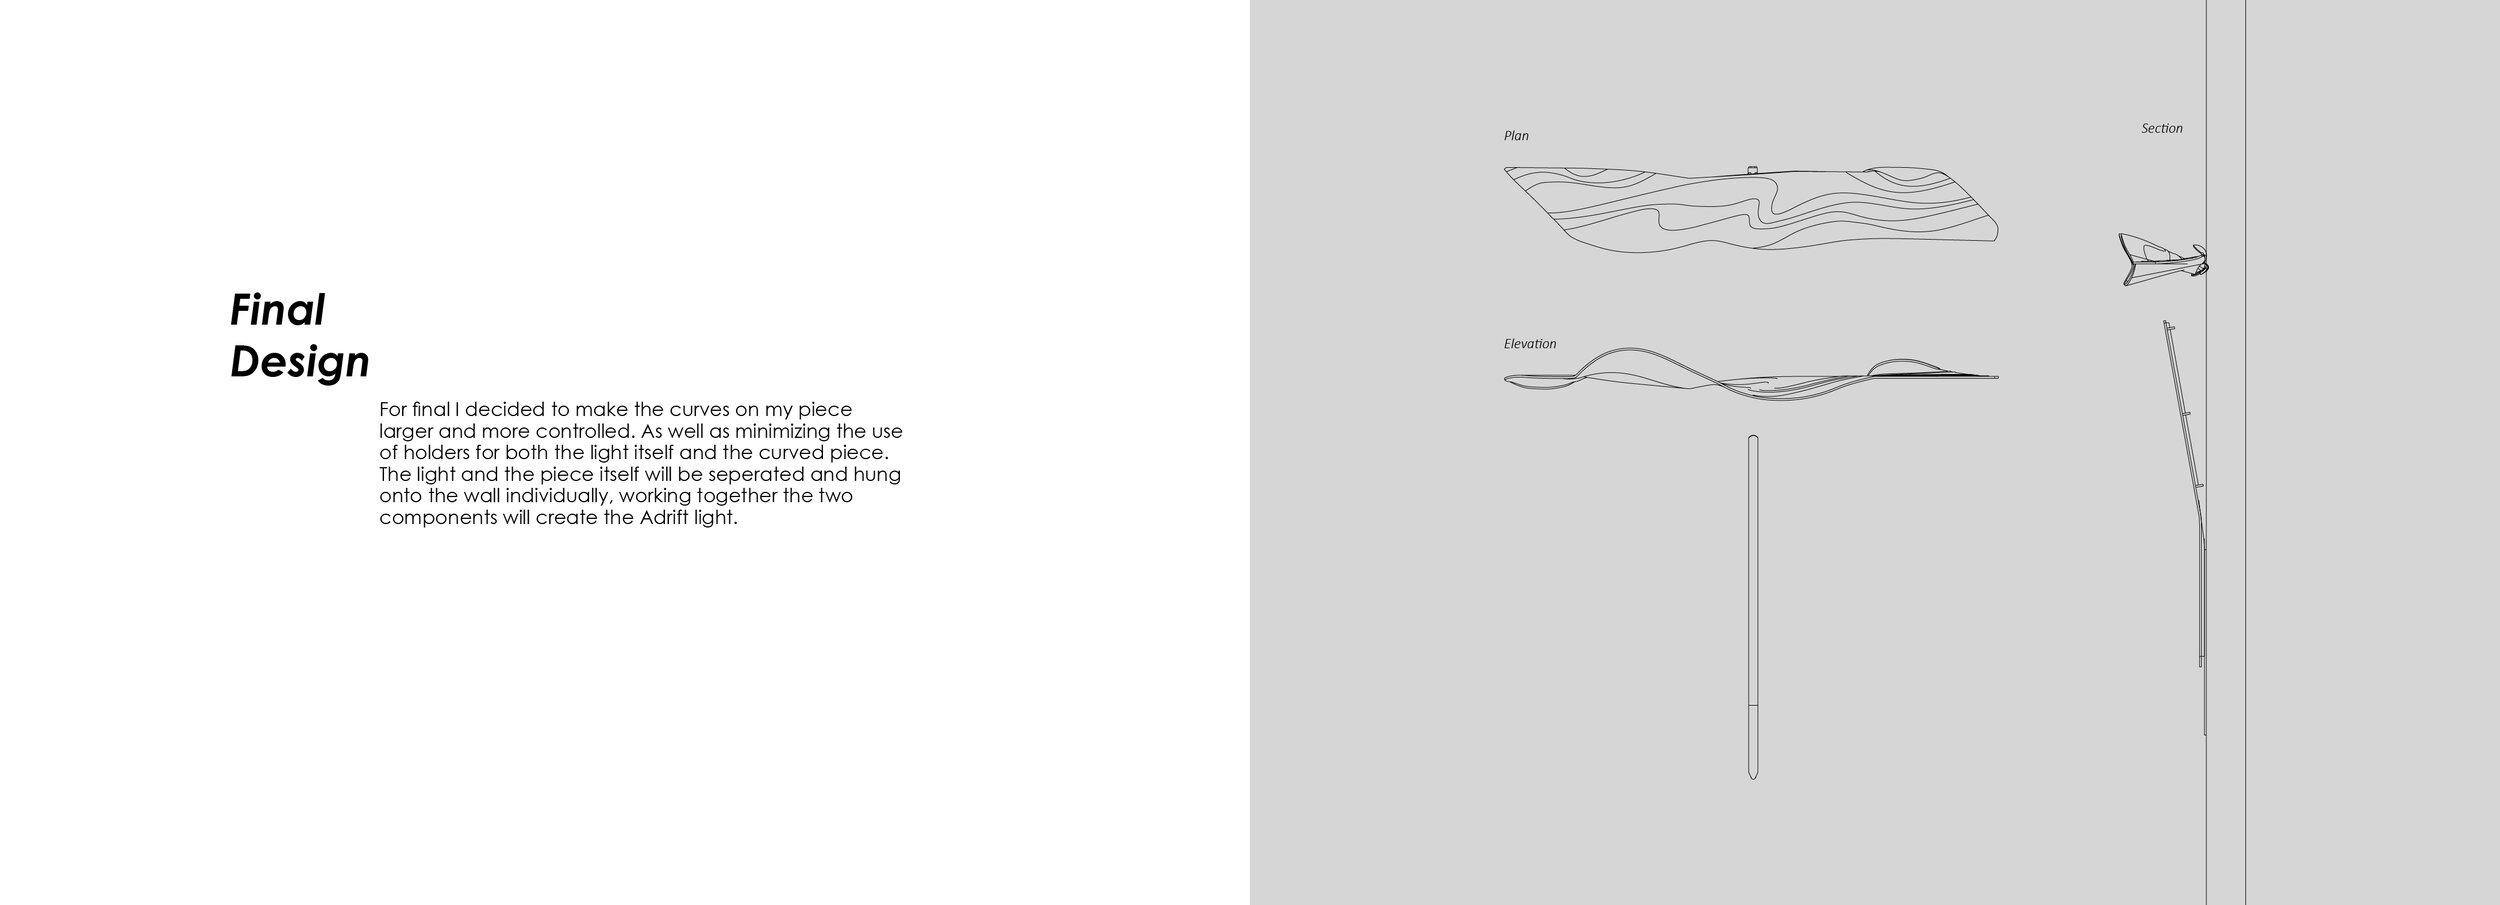 process book12.jpg